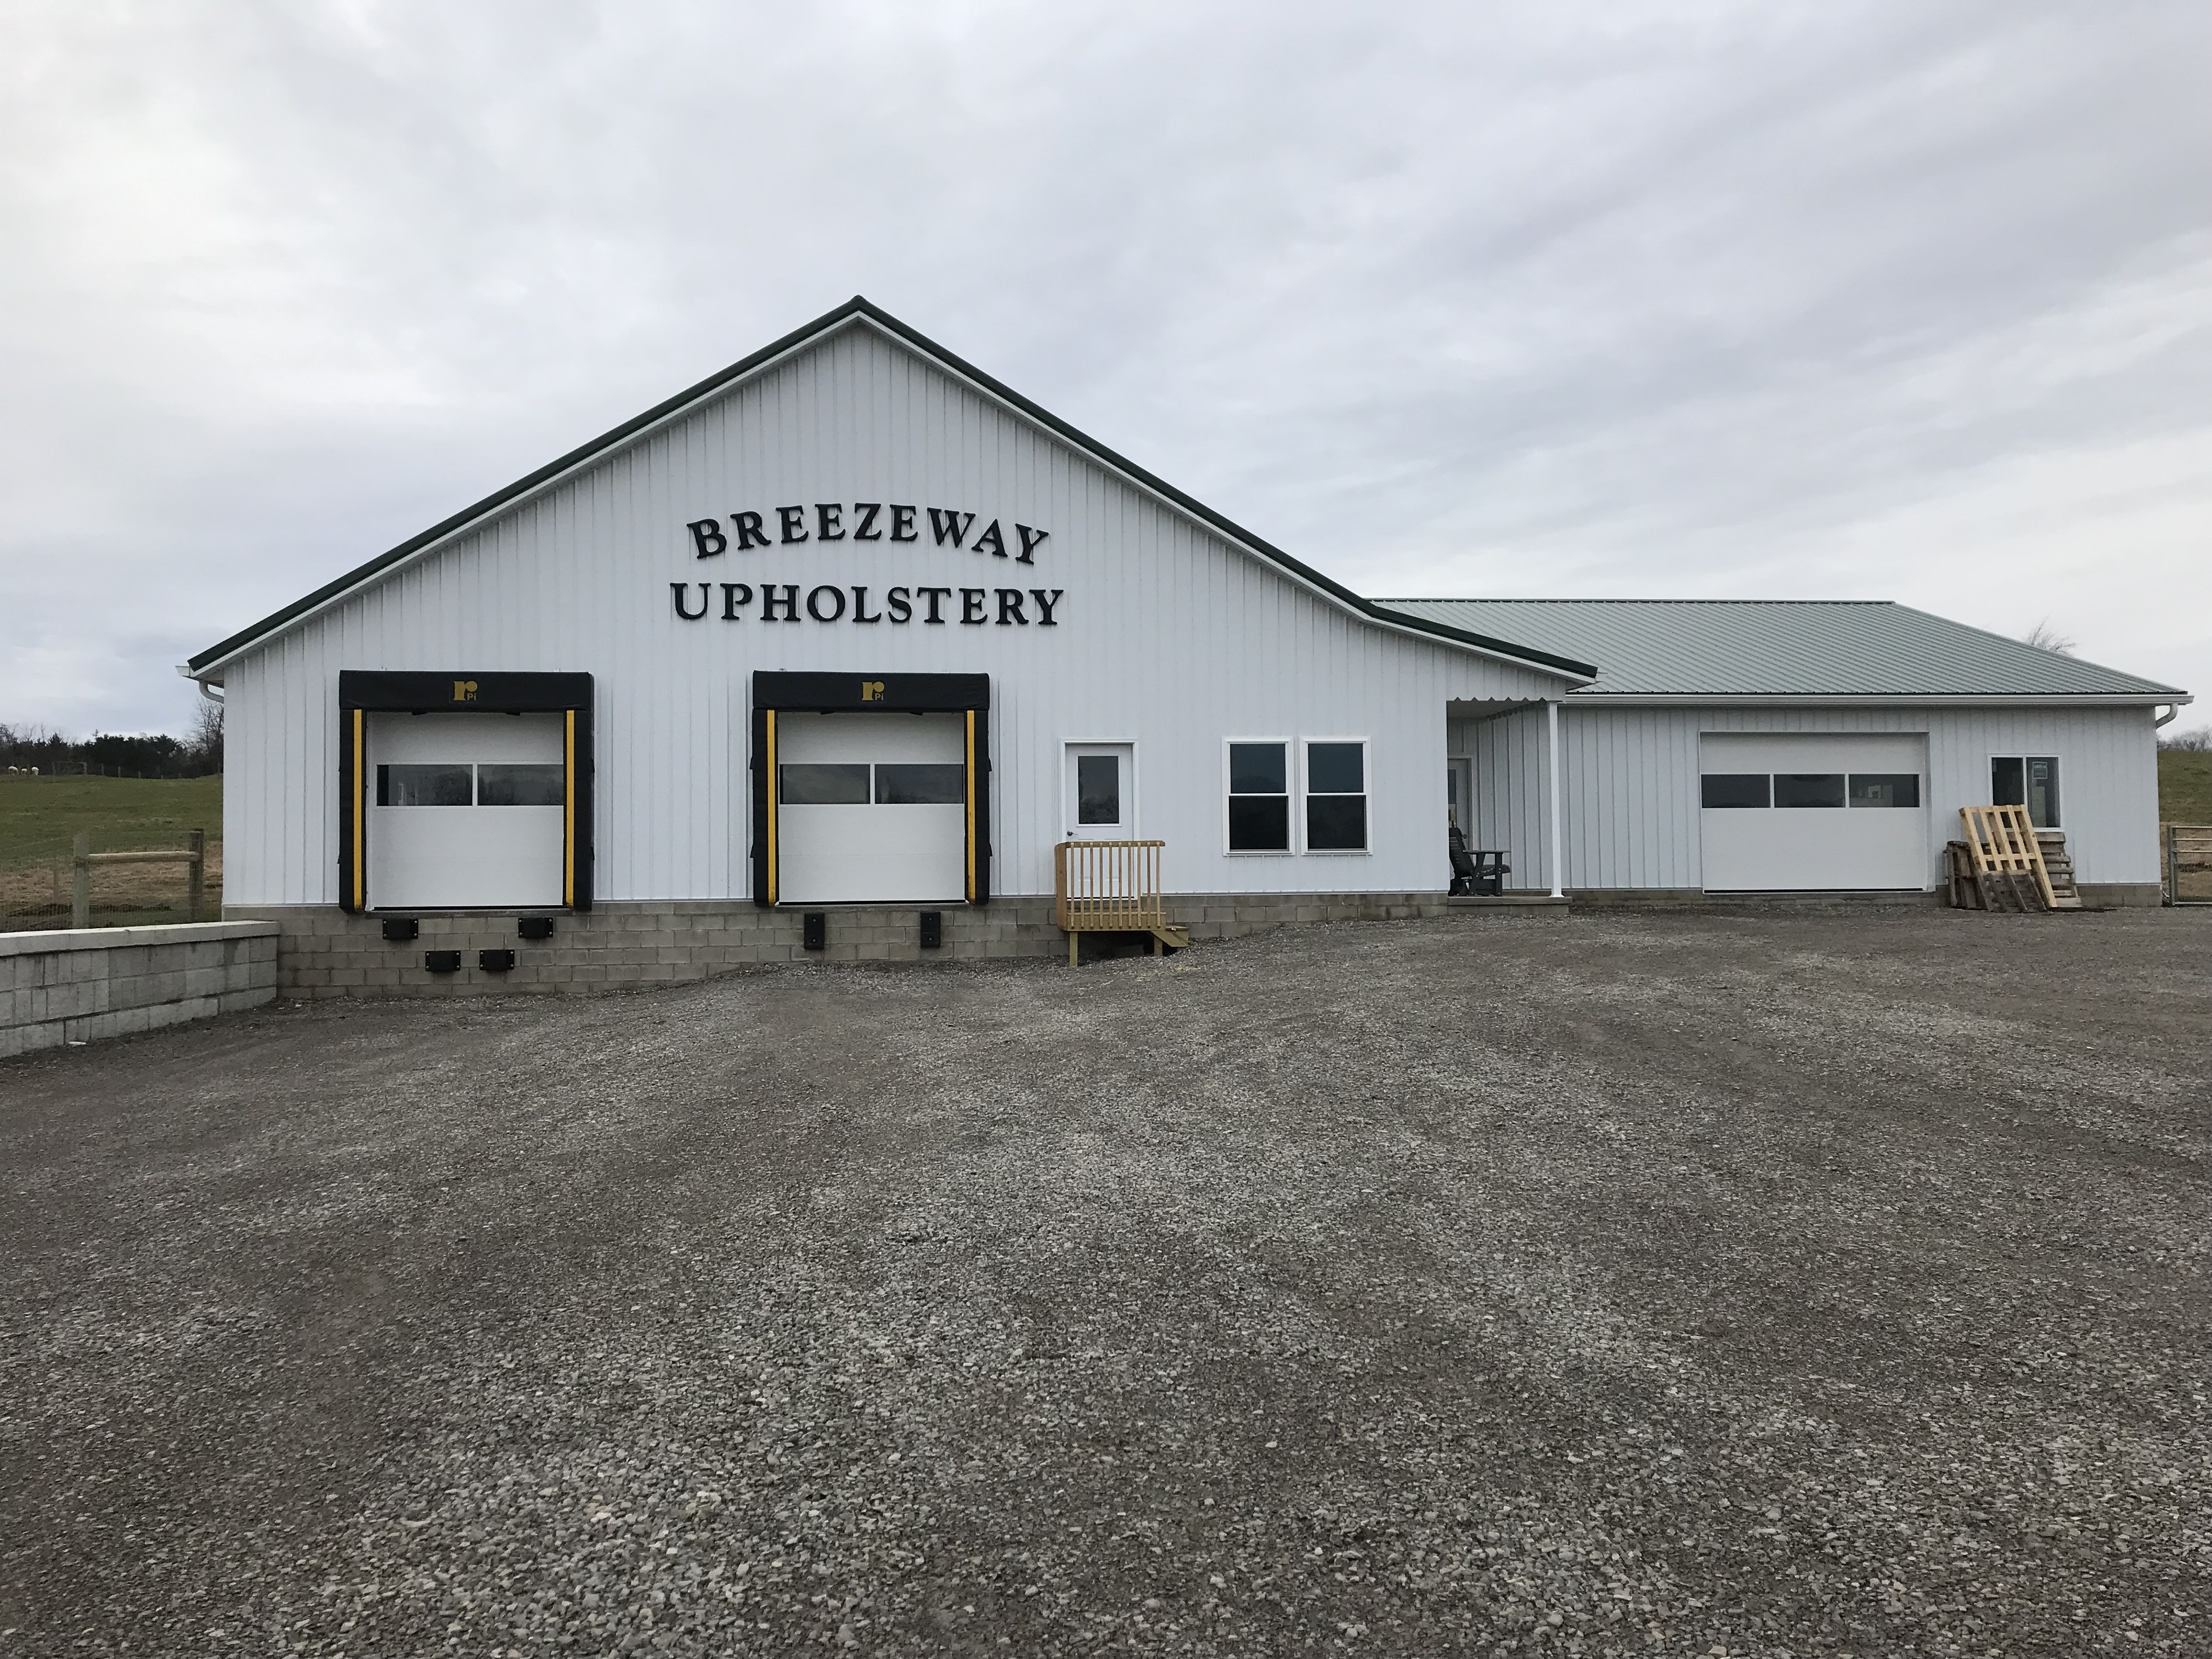 Breezeway Letters